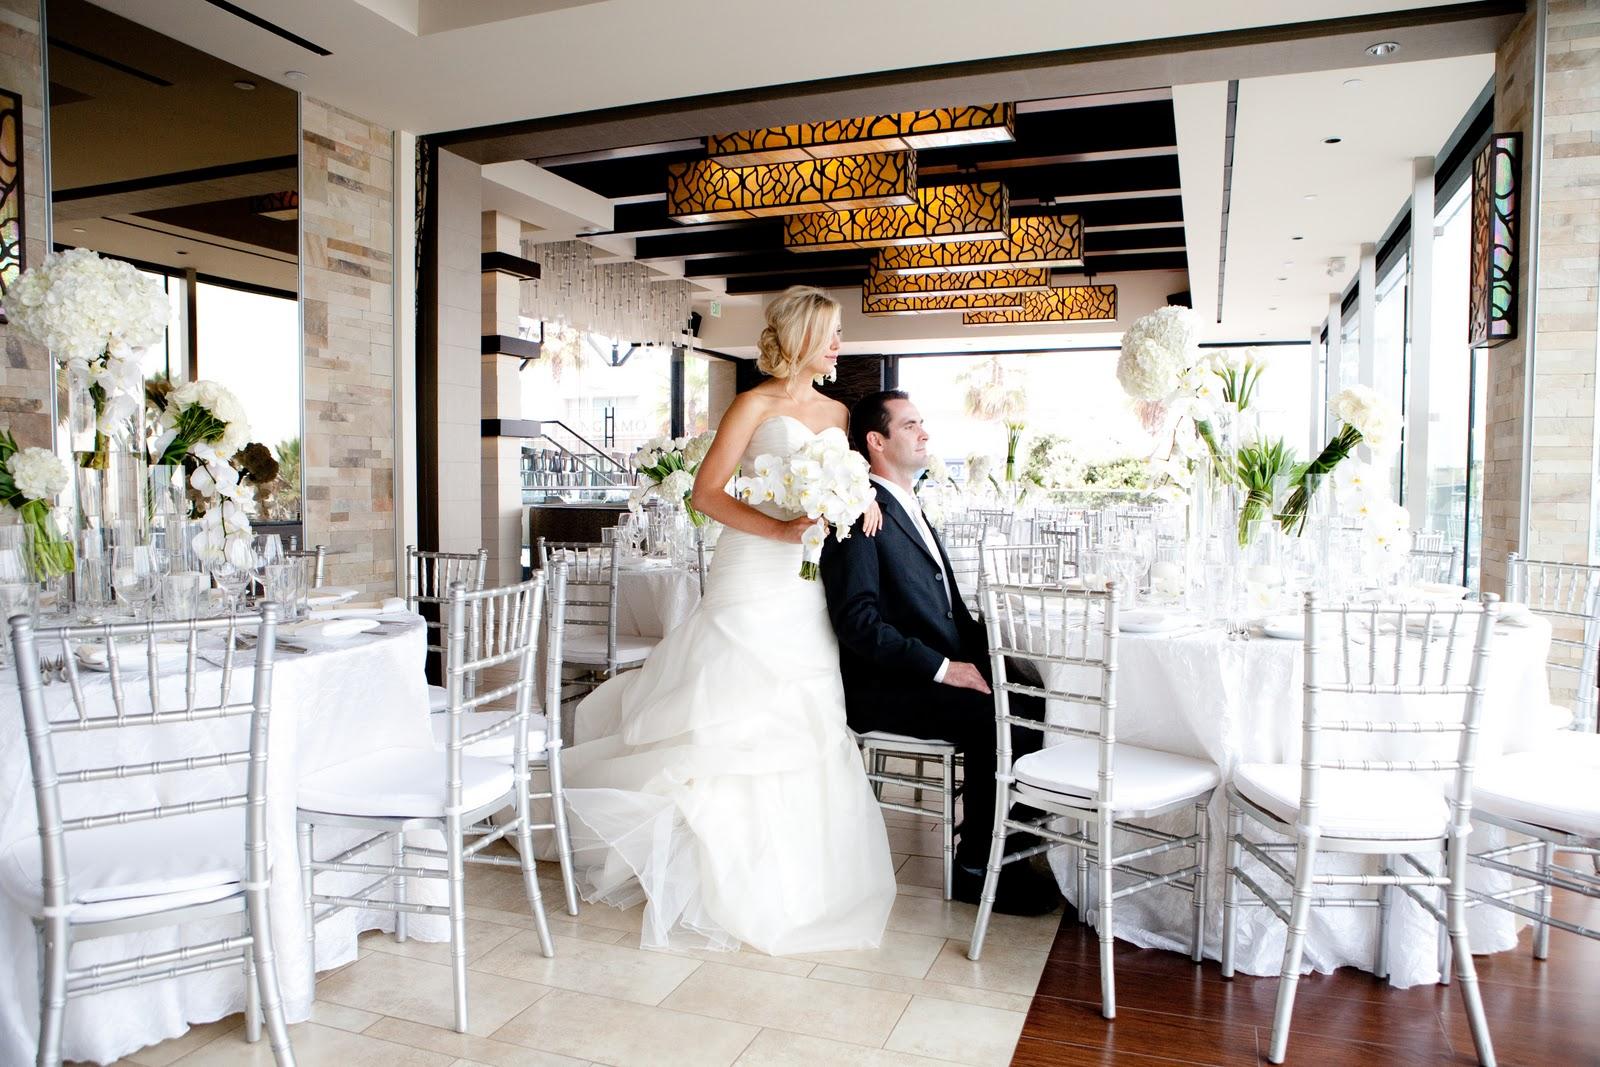 Eis house wedding